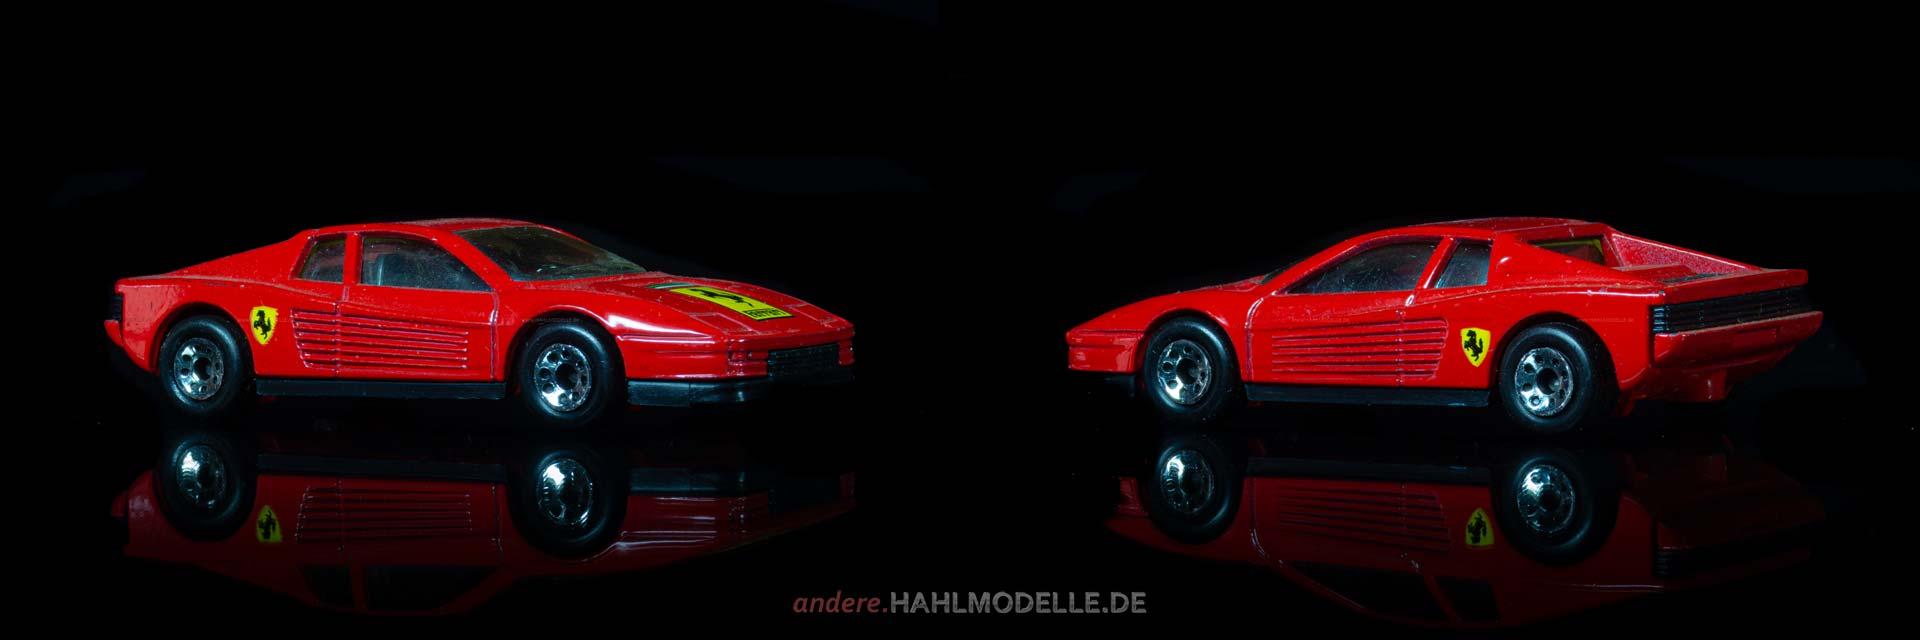 Ferrari Testarossa | Sportwagen | Matchbox Toys Ltd. | 1:59 | www.andere.hahlmodelle.de